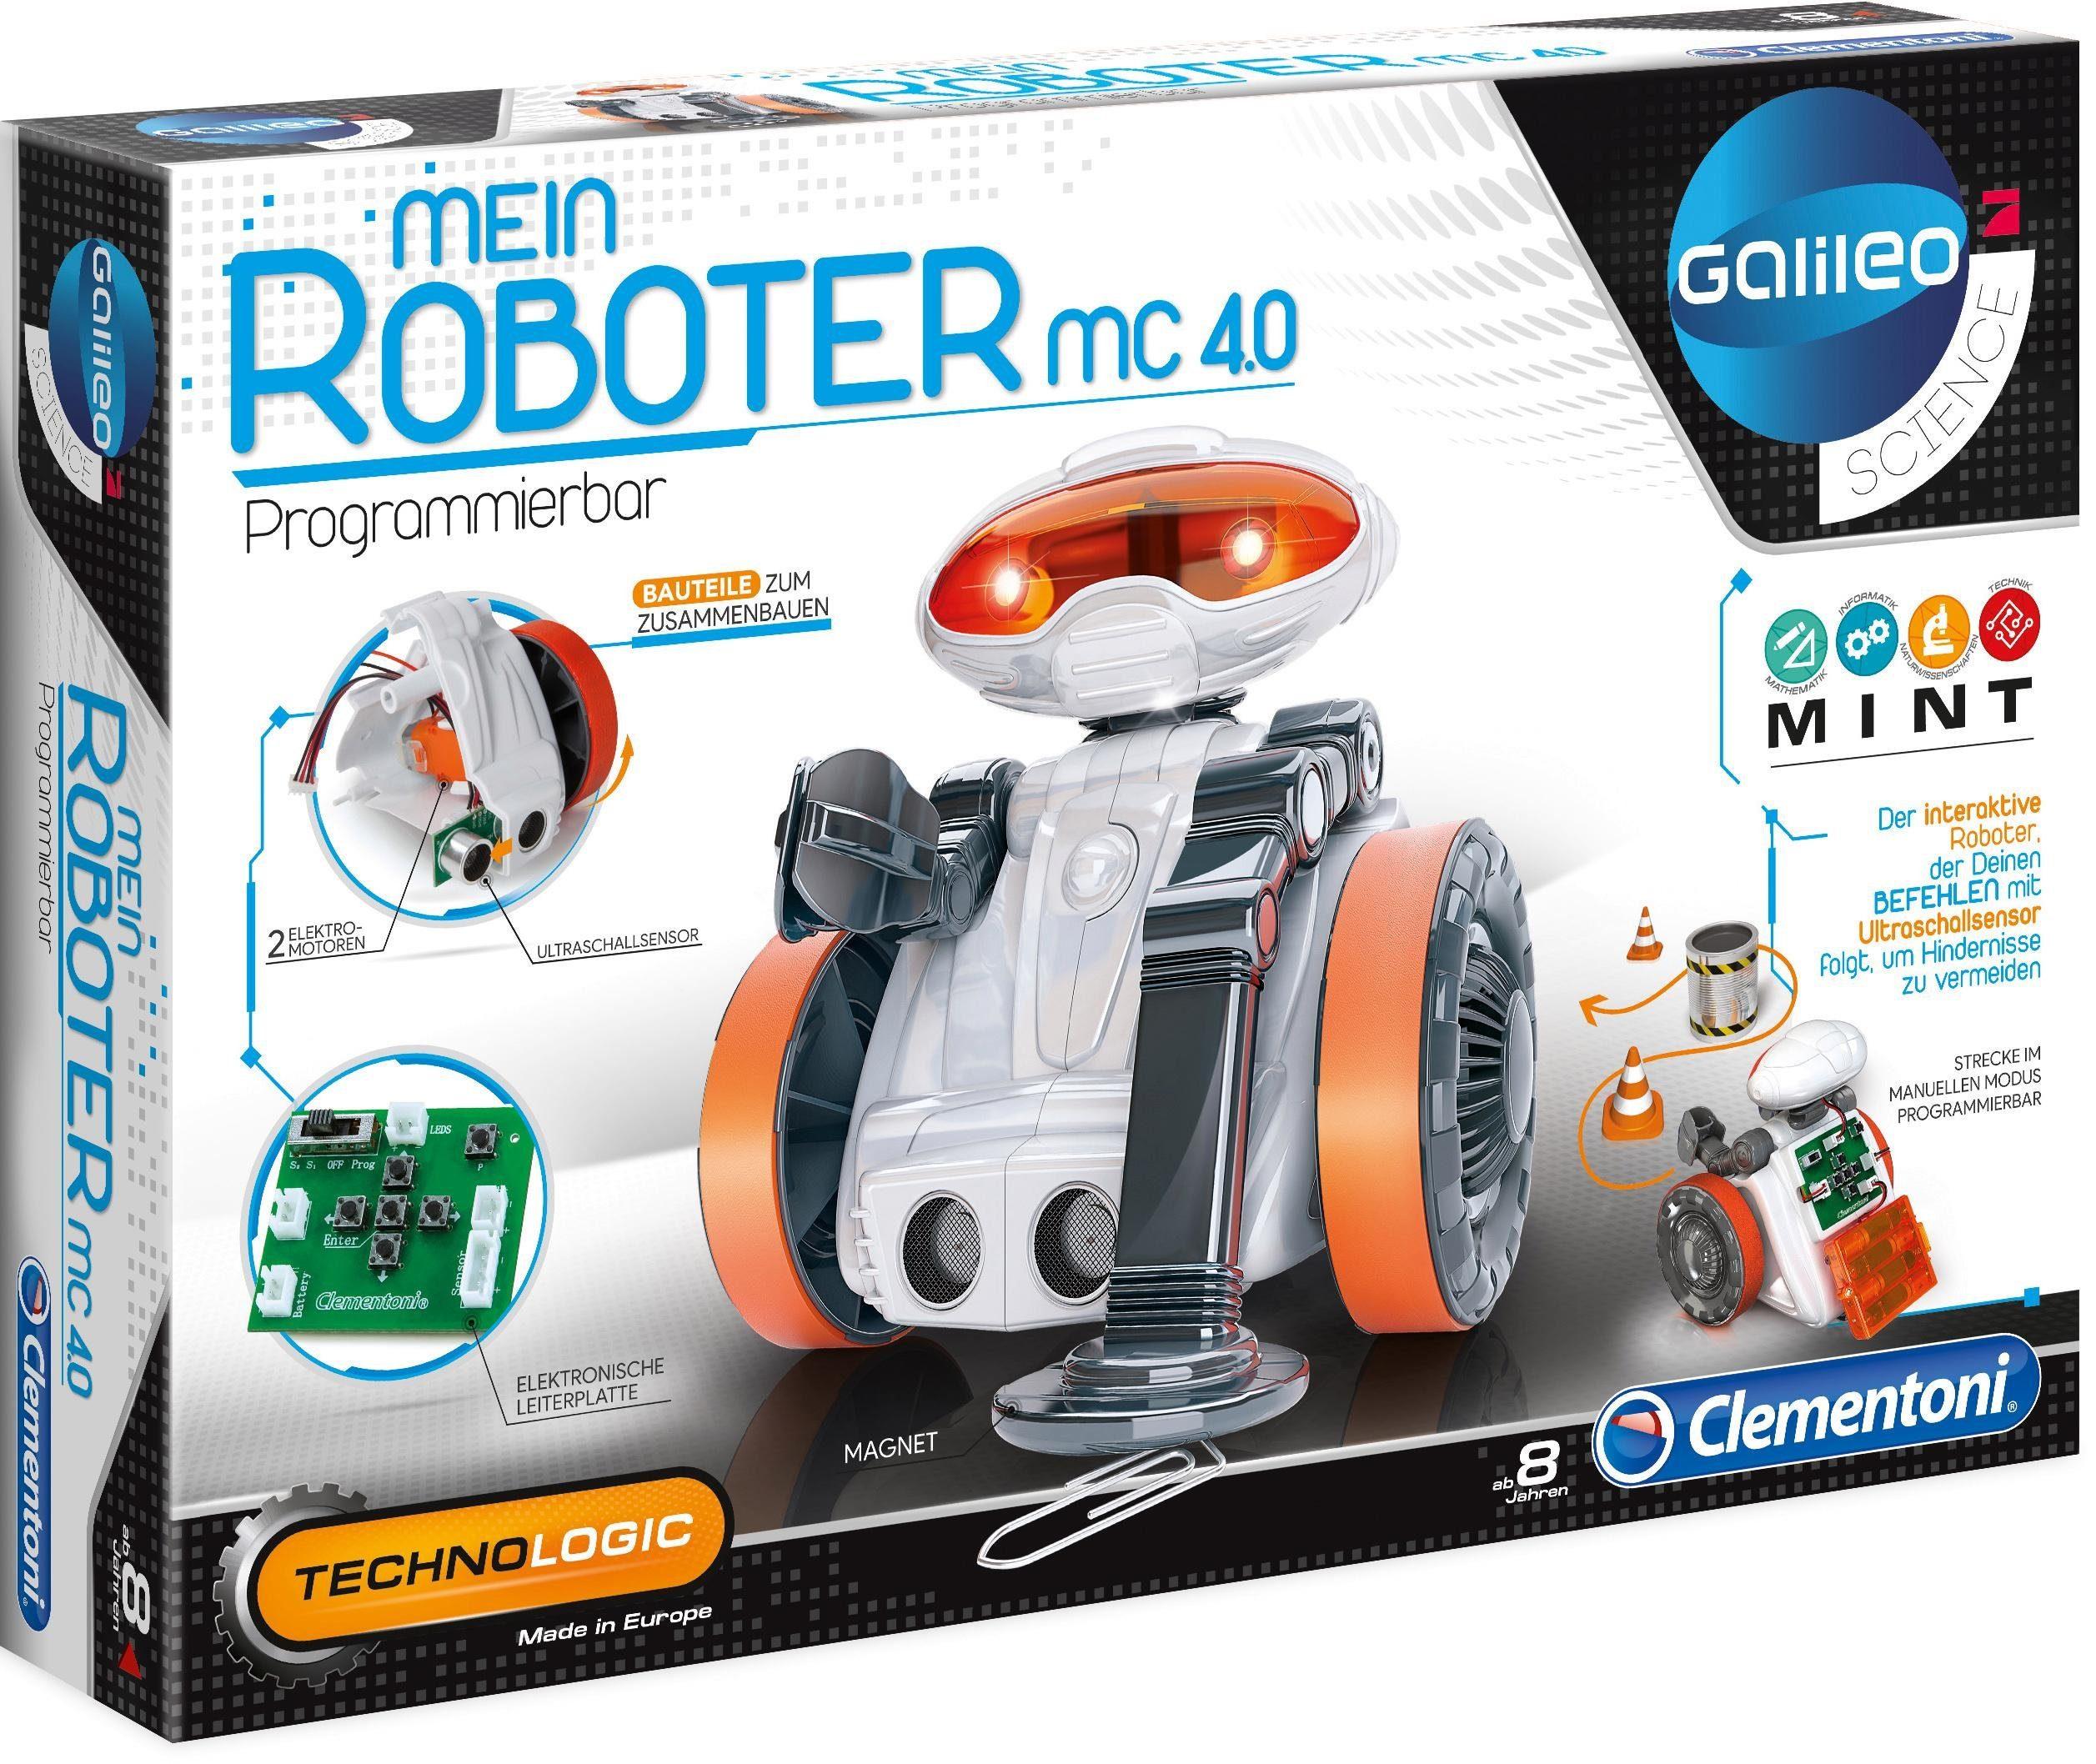 Clementoni Experimentierkasten, »Galileo - Mein Roboter MC 4.0«